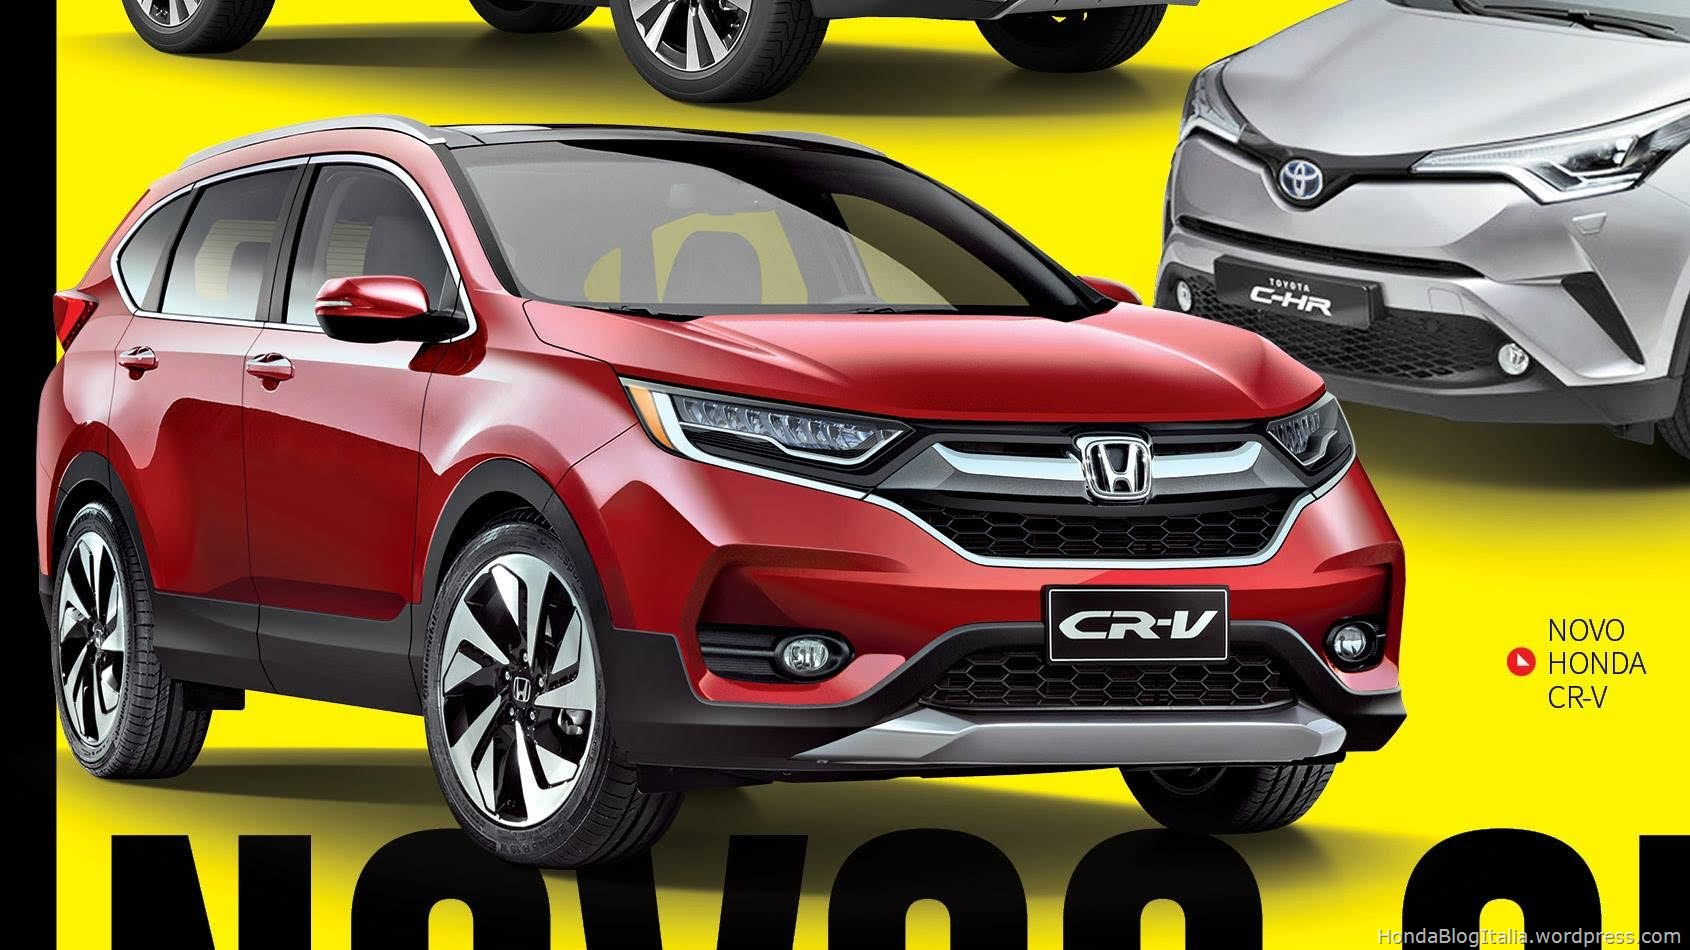 Honda cr v v 2017 nuovo rendering honda blog italia for 2017 honda cr v brochure